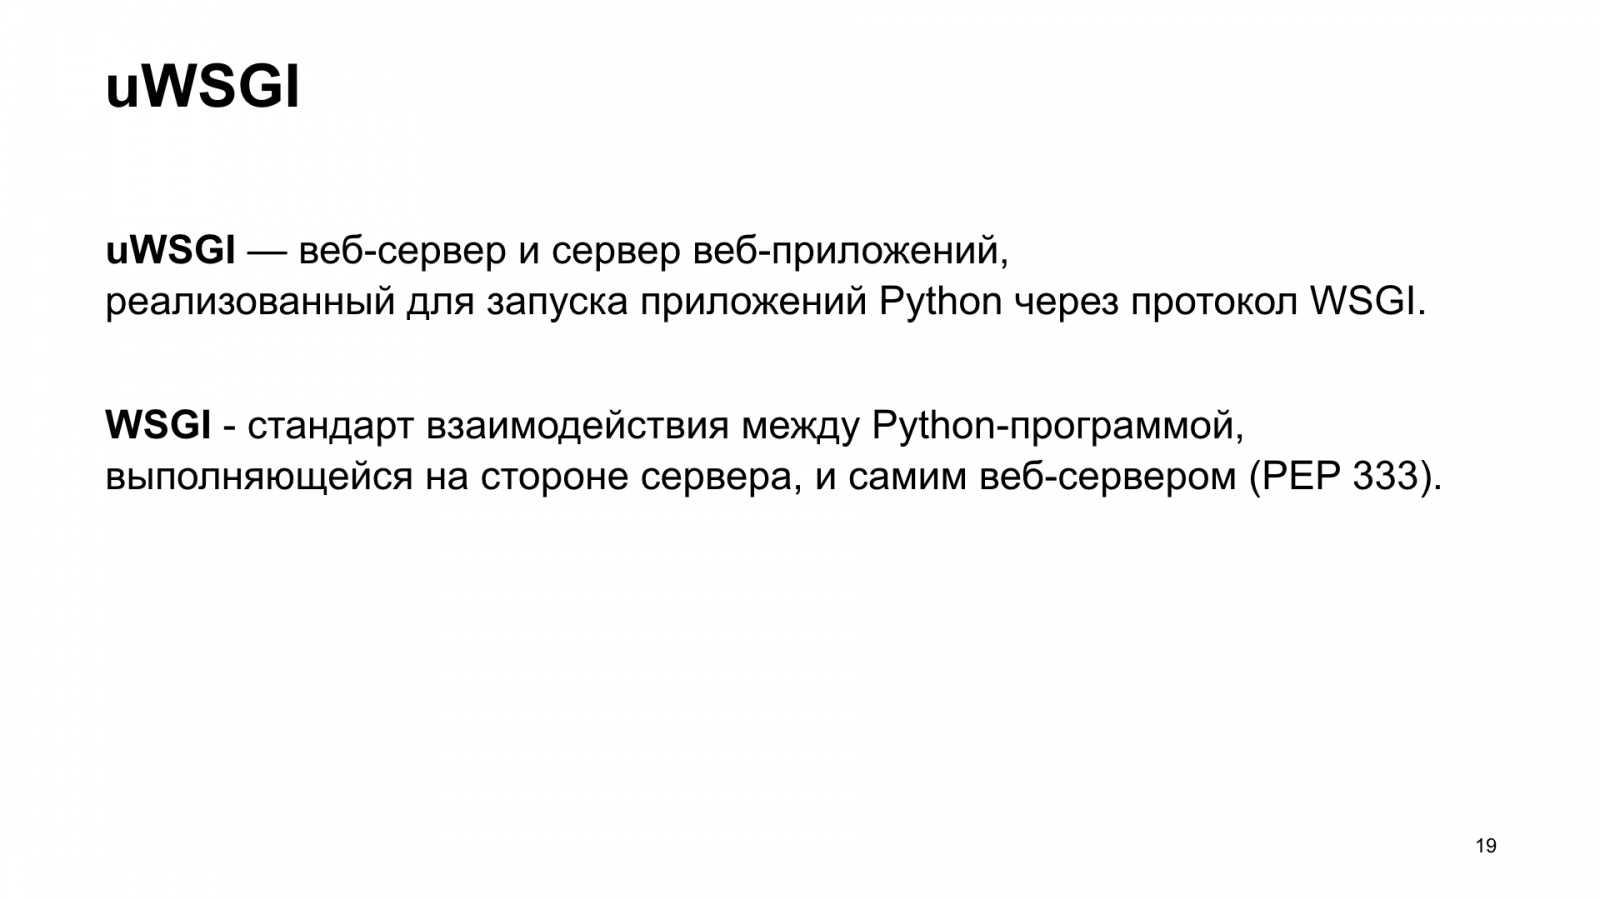 uWSGI в помощь метрикам. Доклад Яндекса - 12